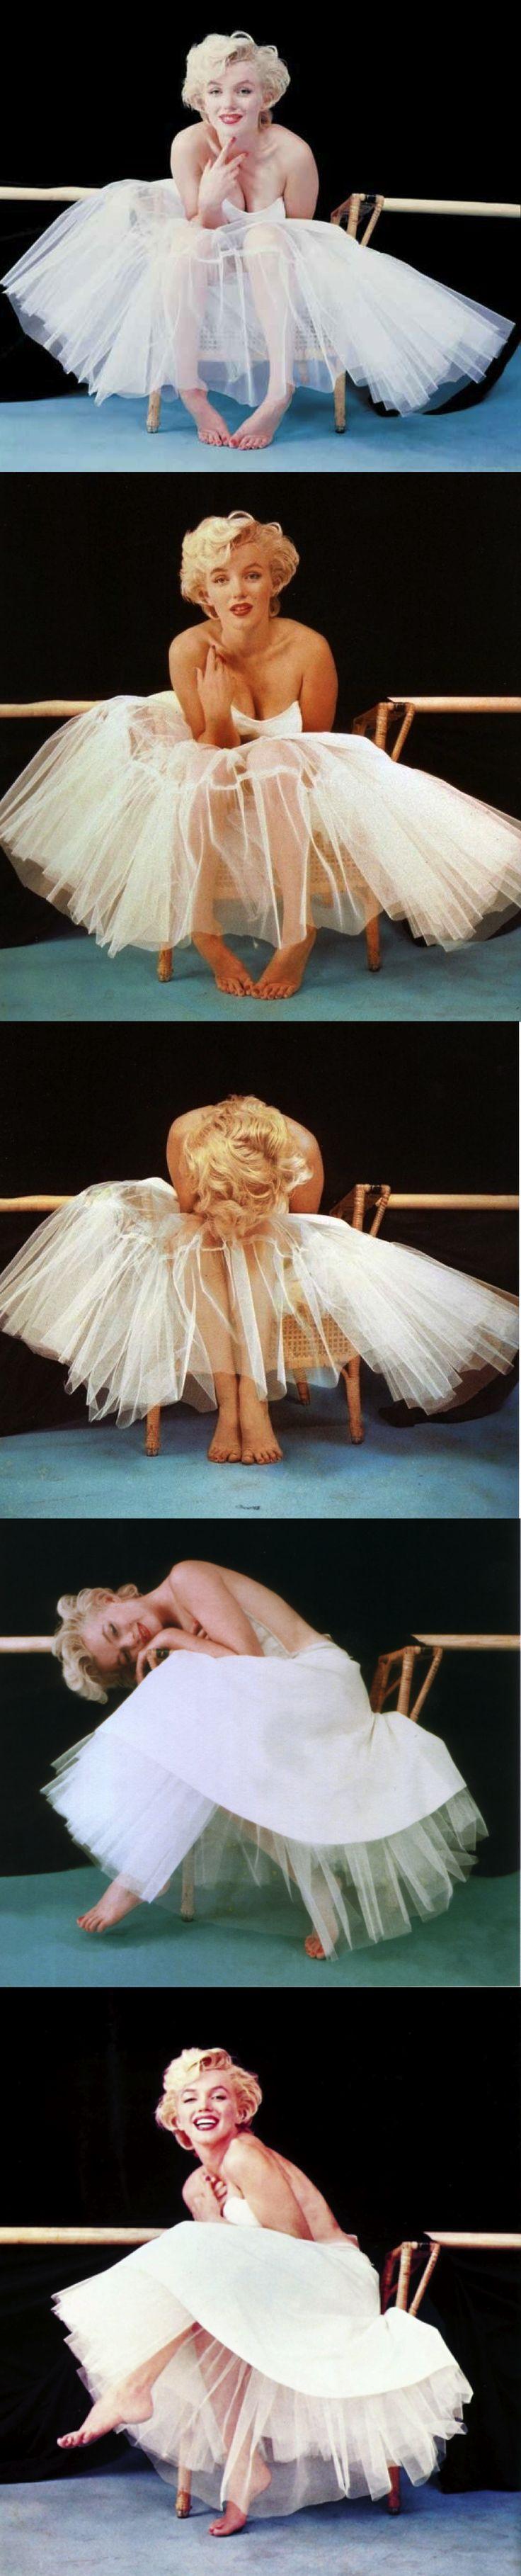 Marilyn Monroe, 1954, New York, Ballerina sitting by Milton H Greene